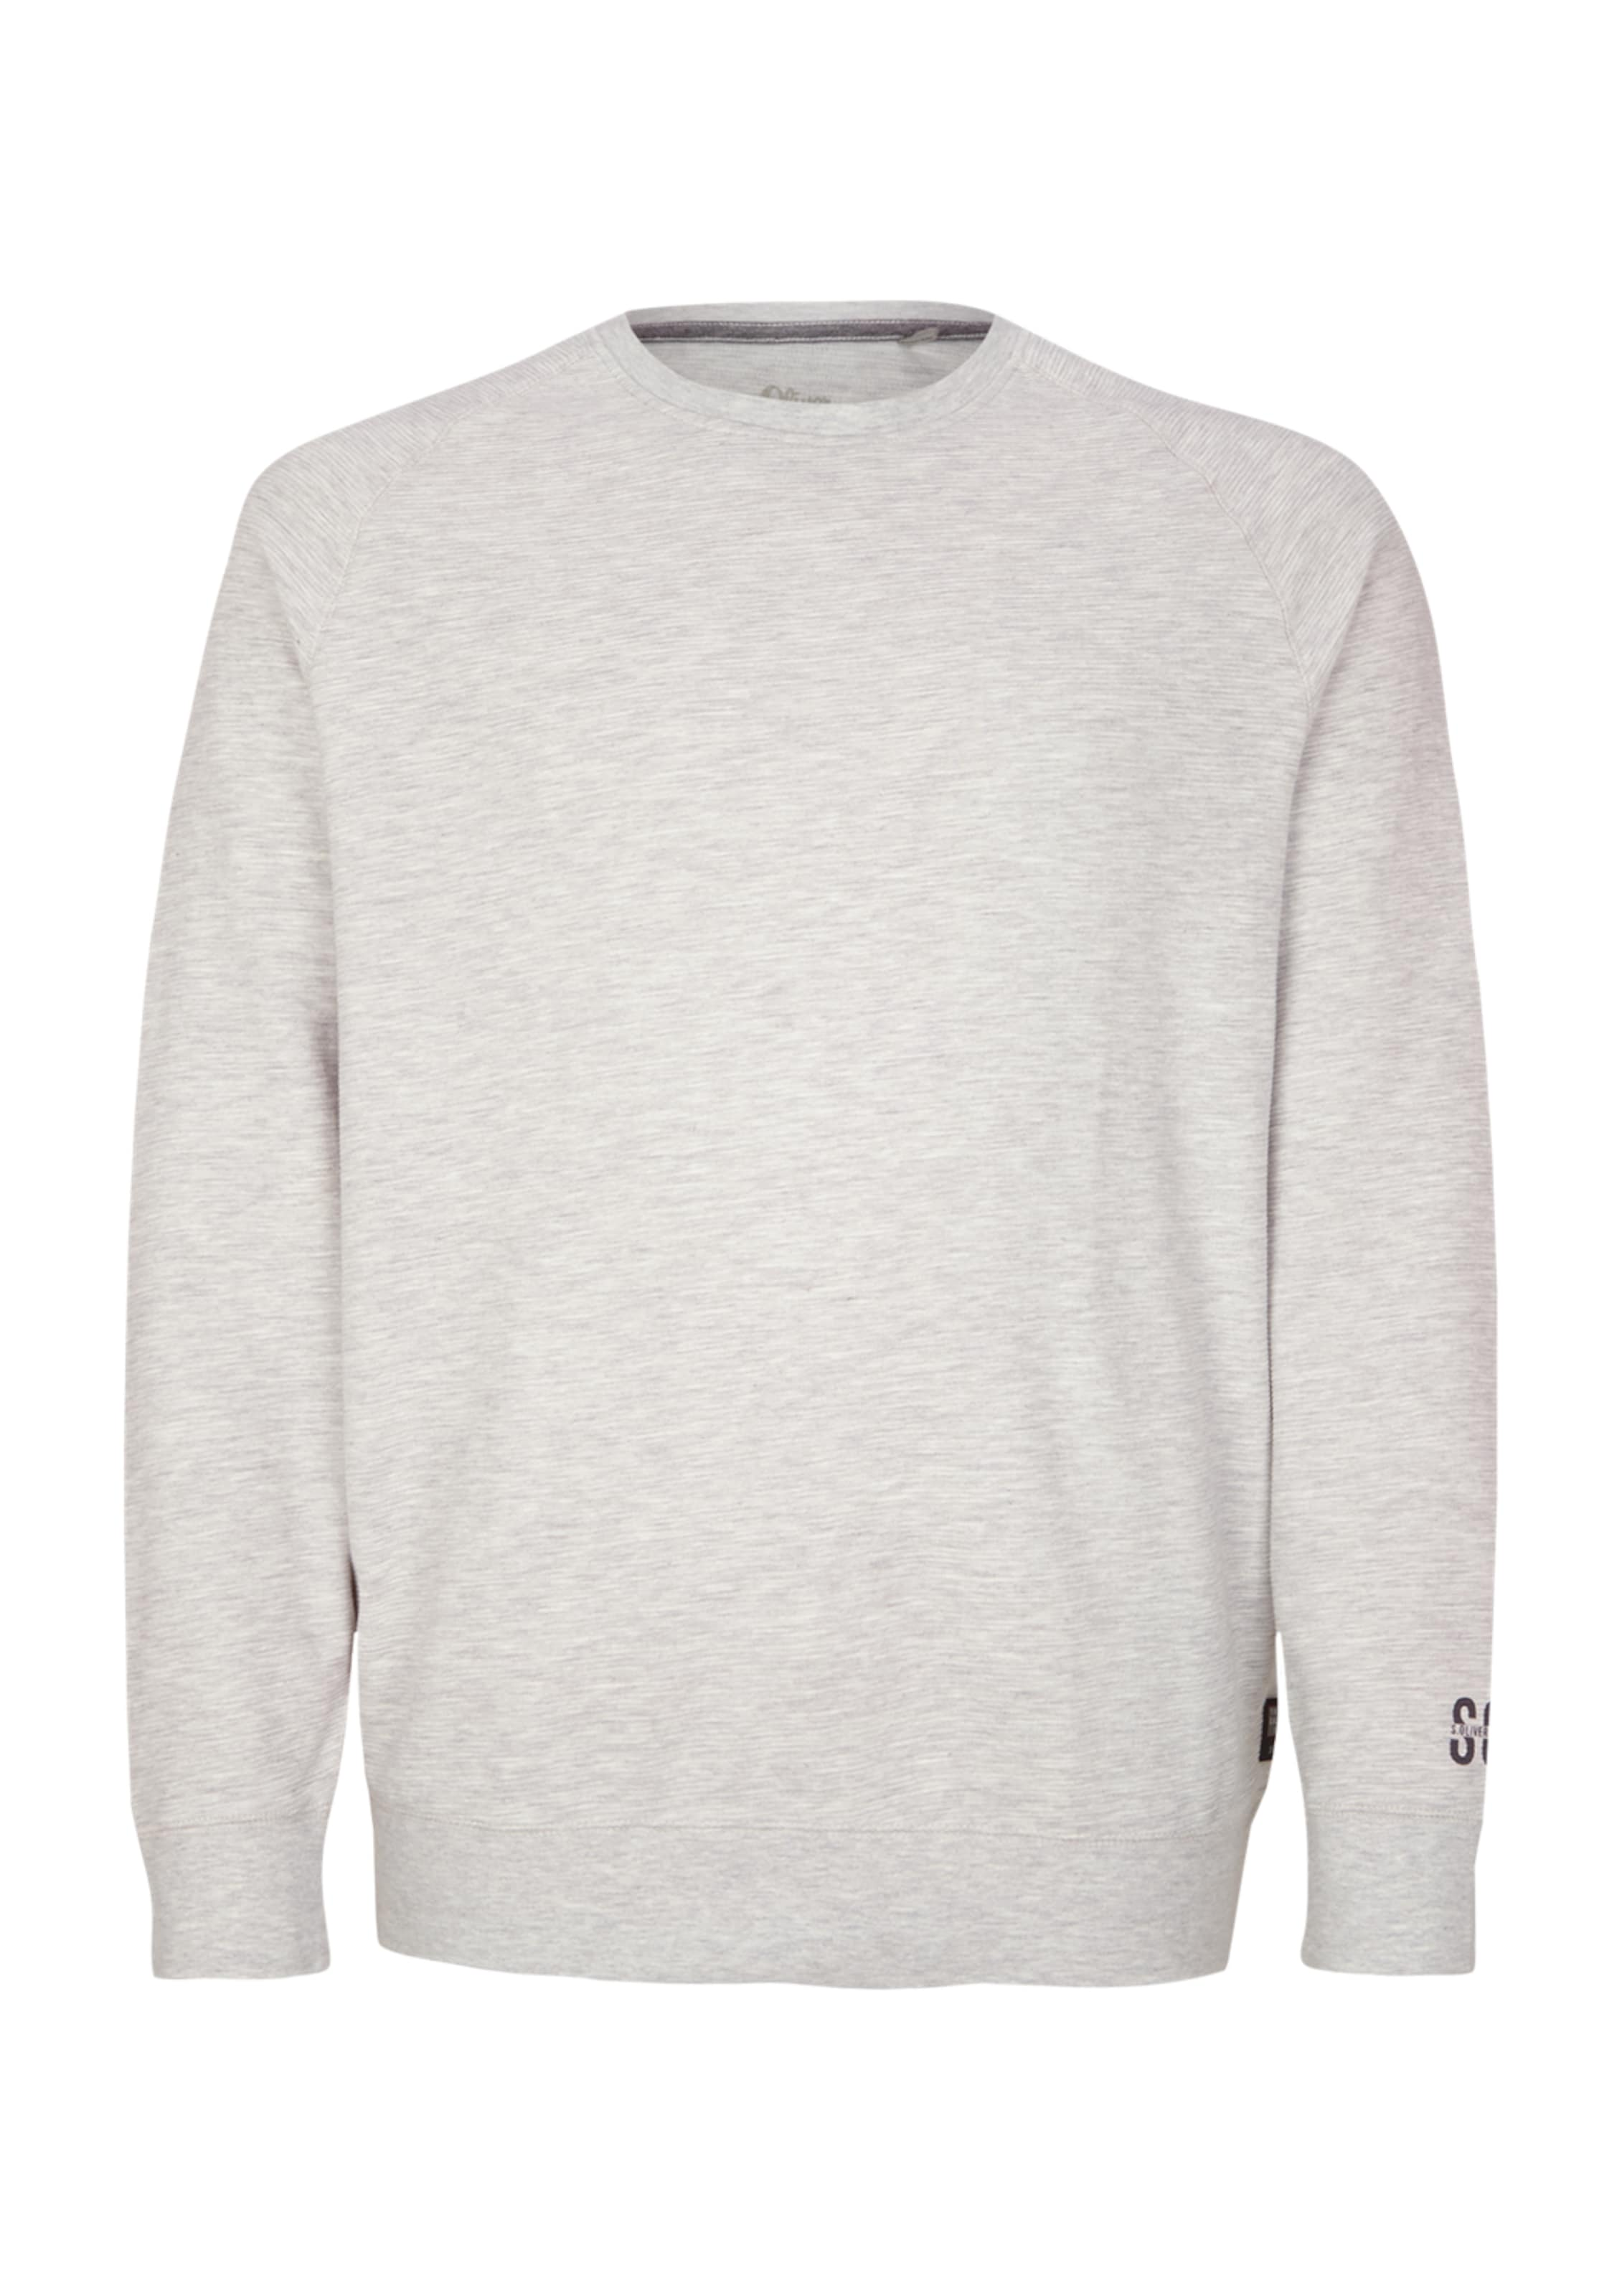 S In oliver Sweatshirt Hellgrau sQthdxrC